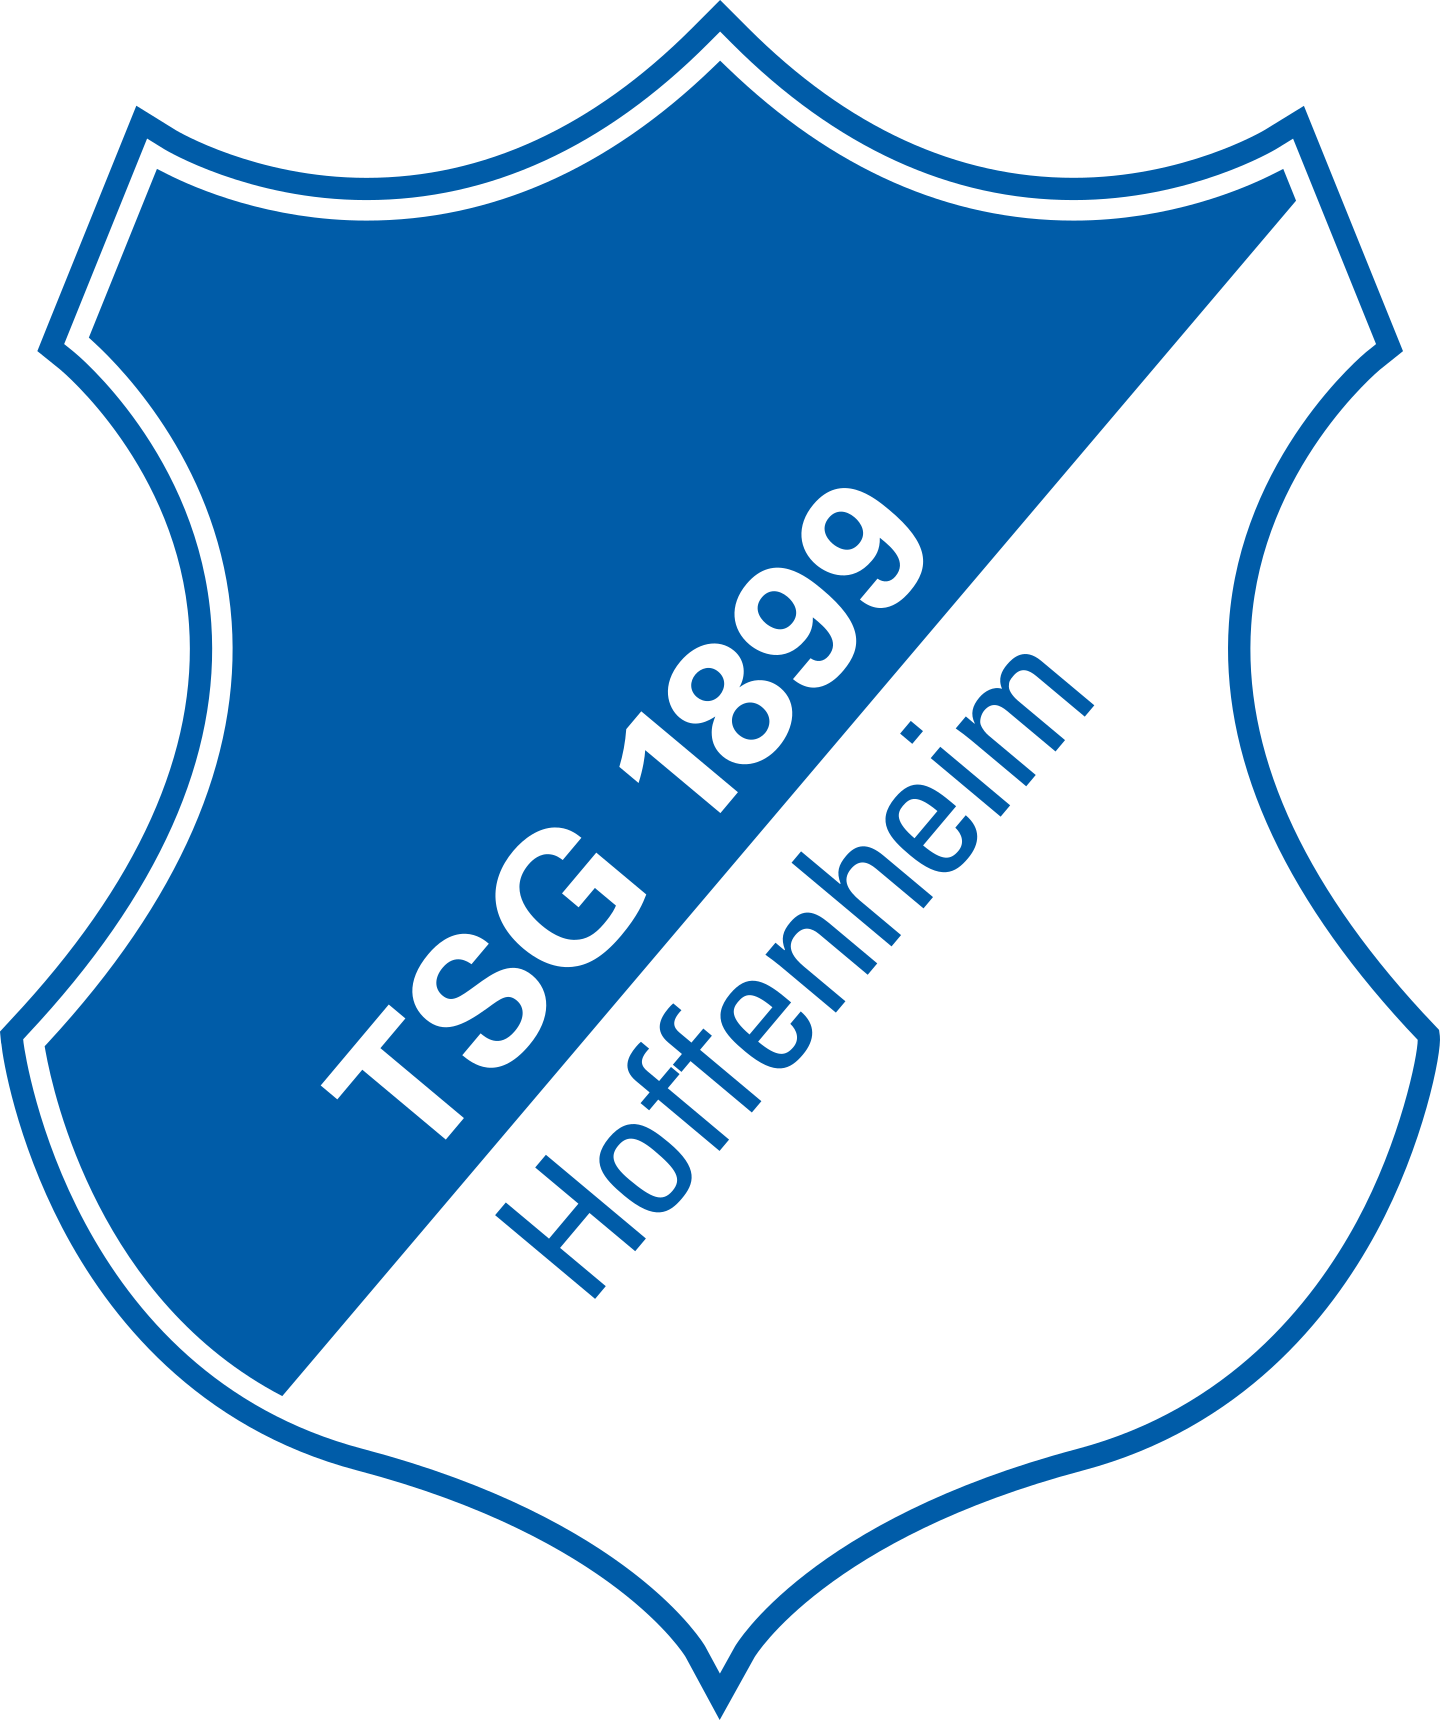 hoffenheim logo 2 - Hoffenheim Logo